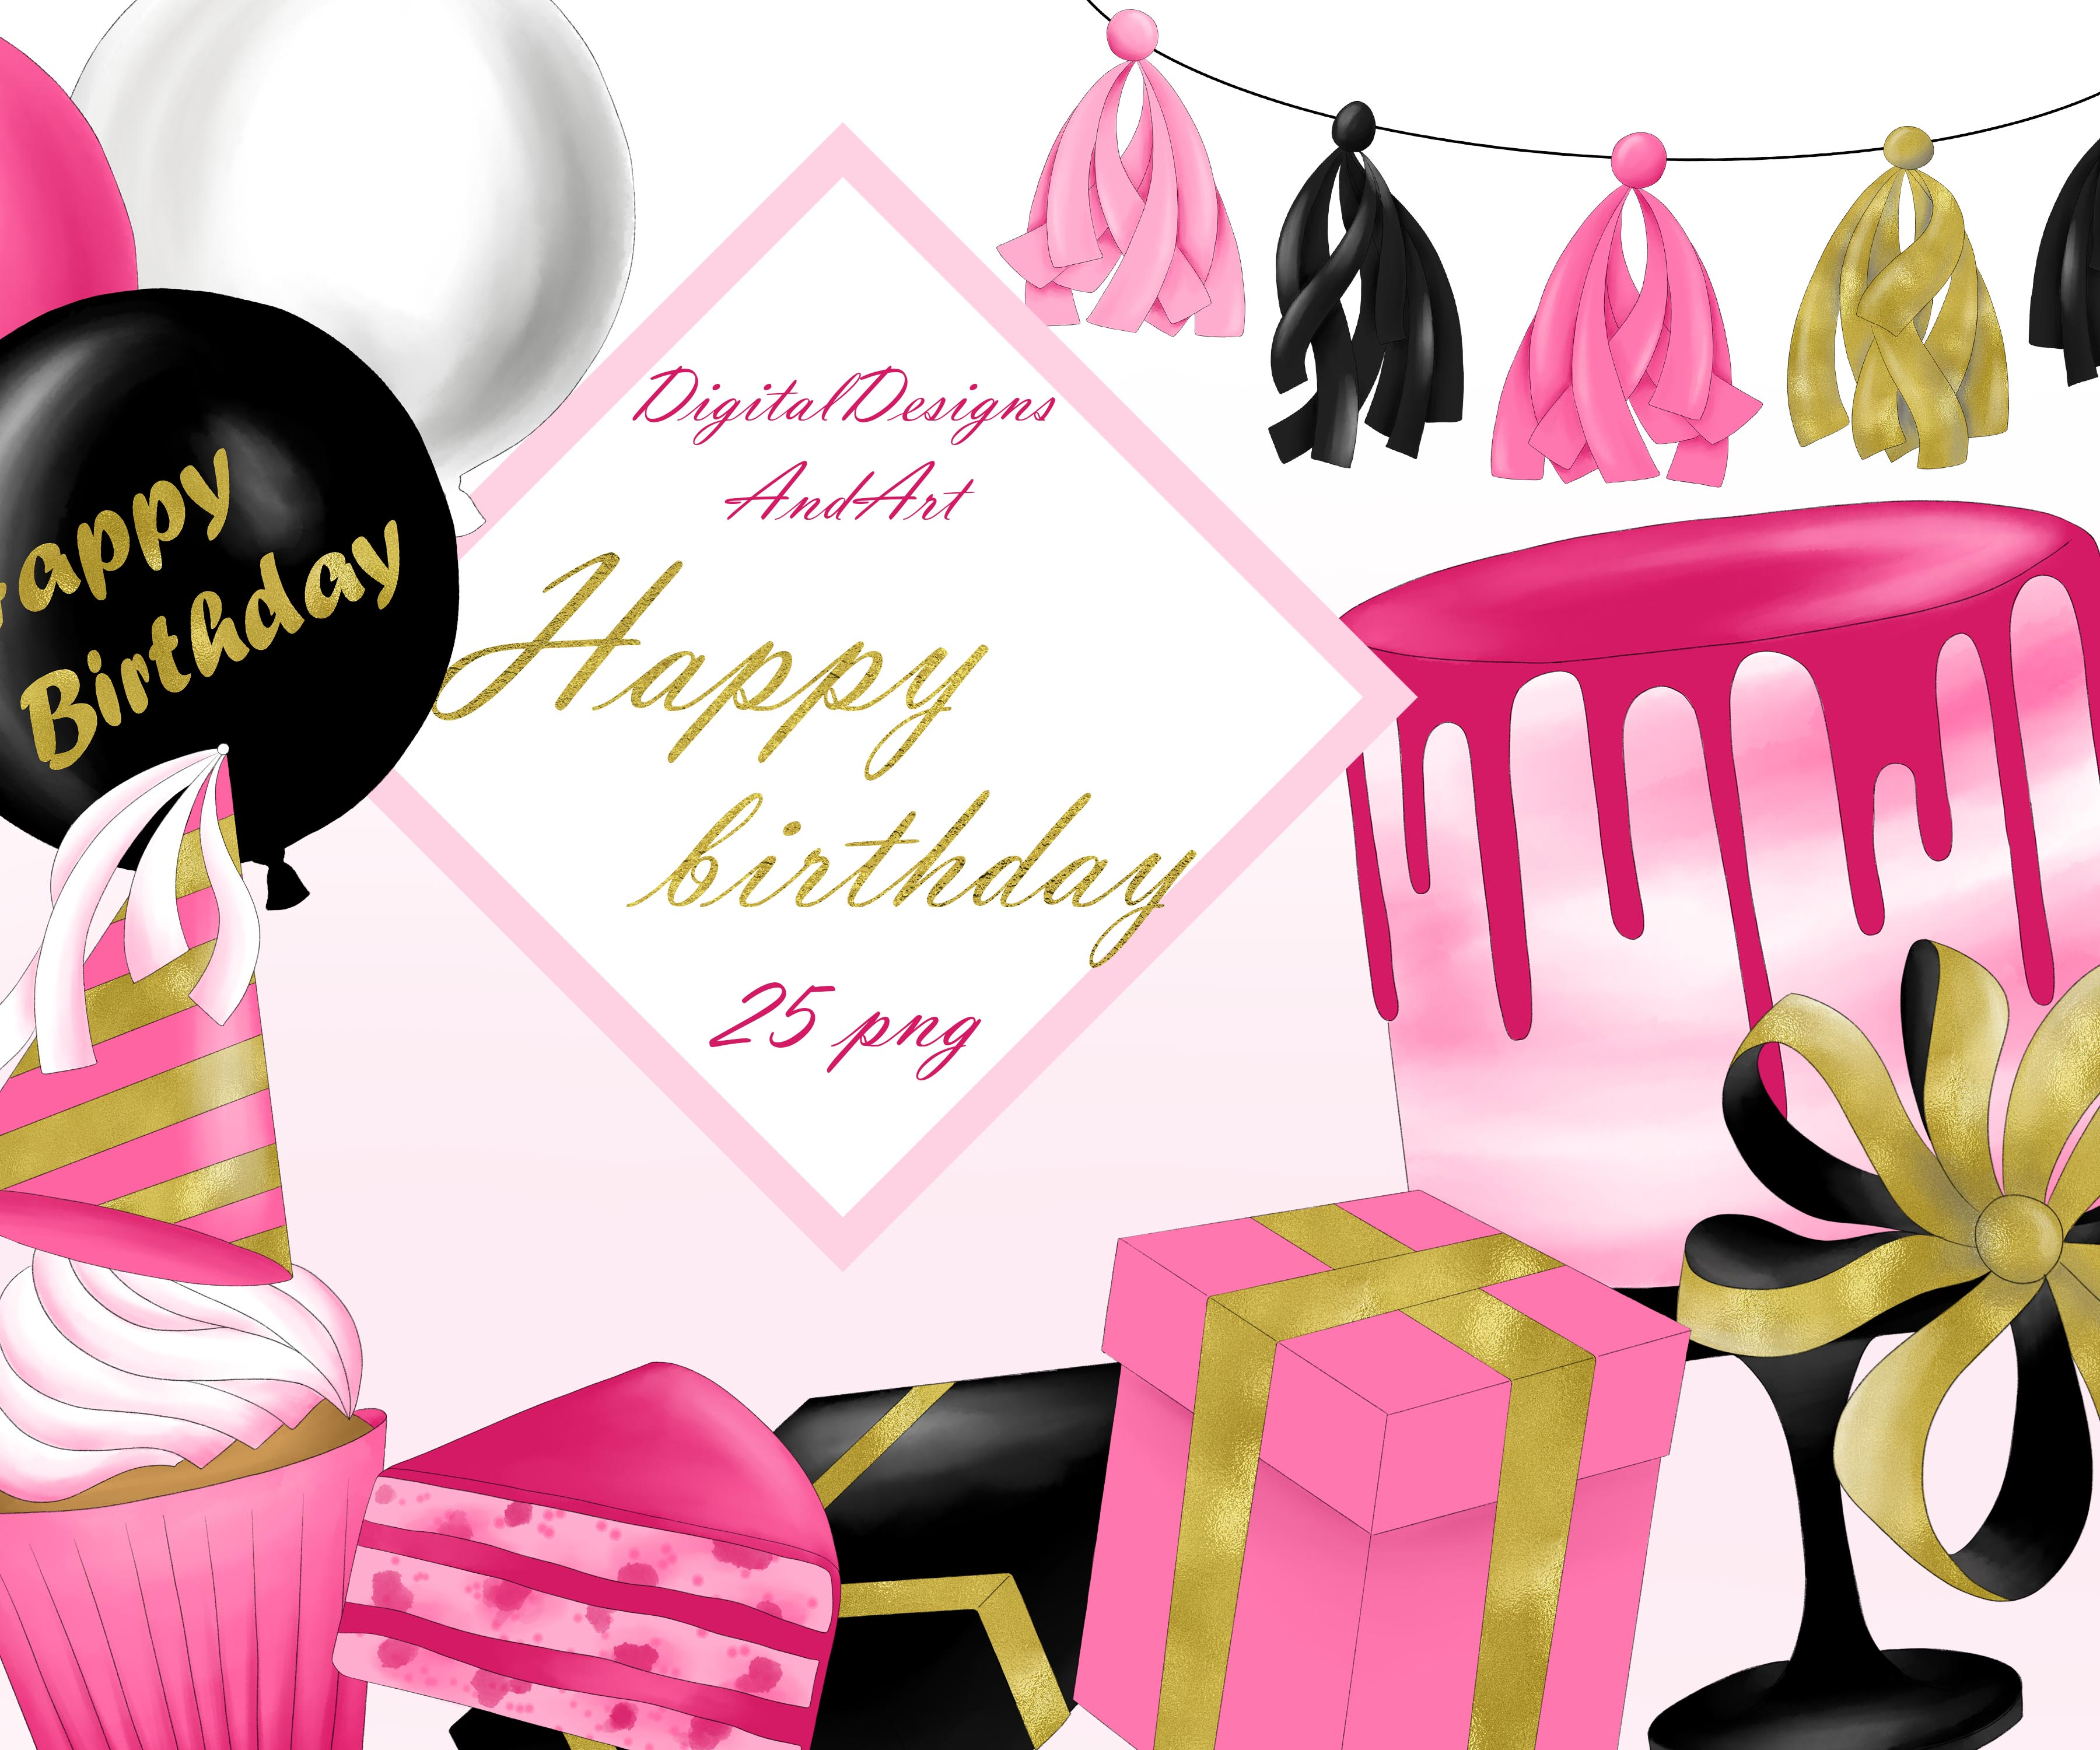 Happy birthday clipart example image 1